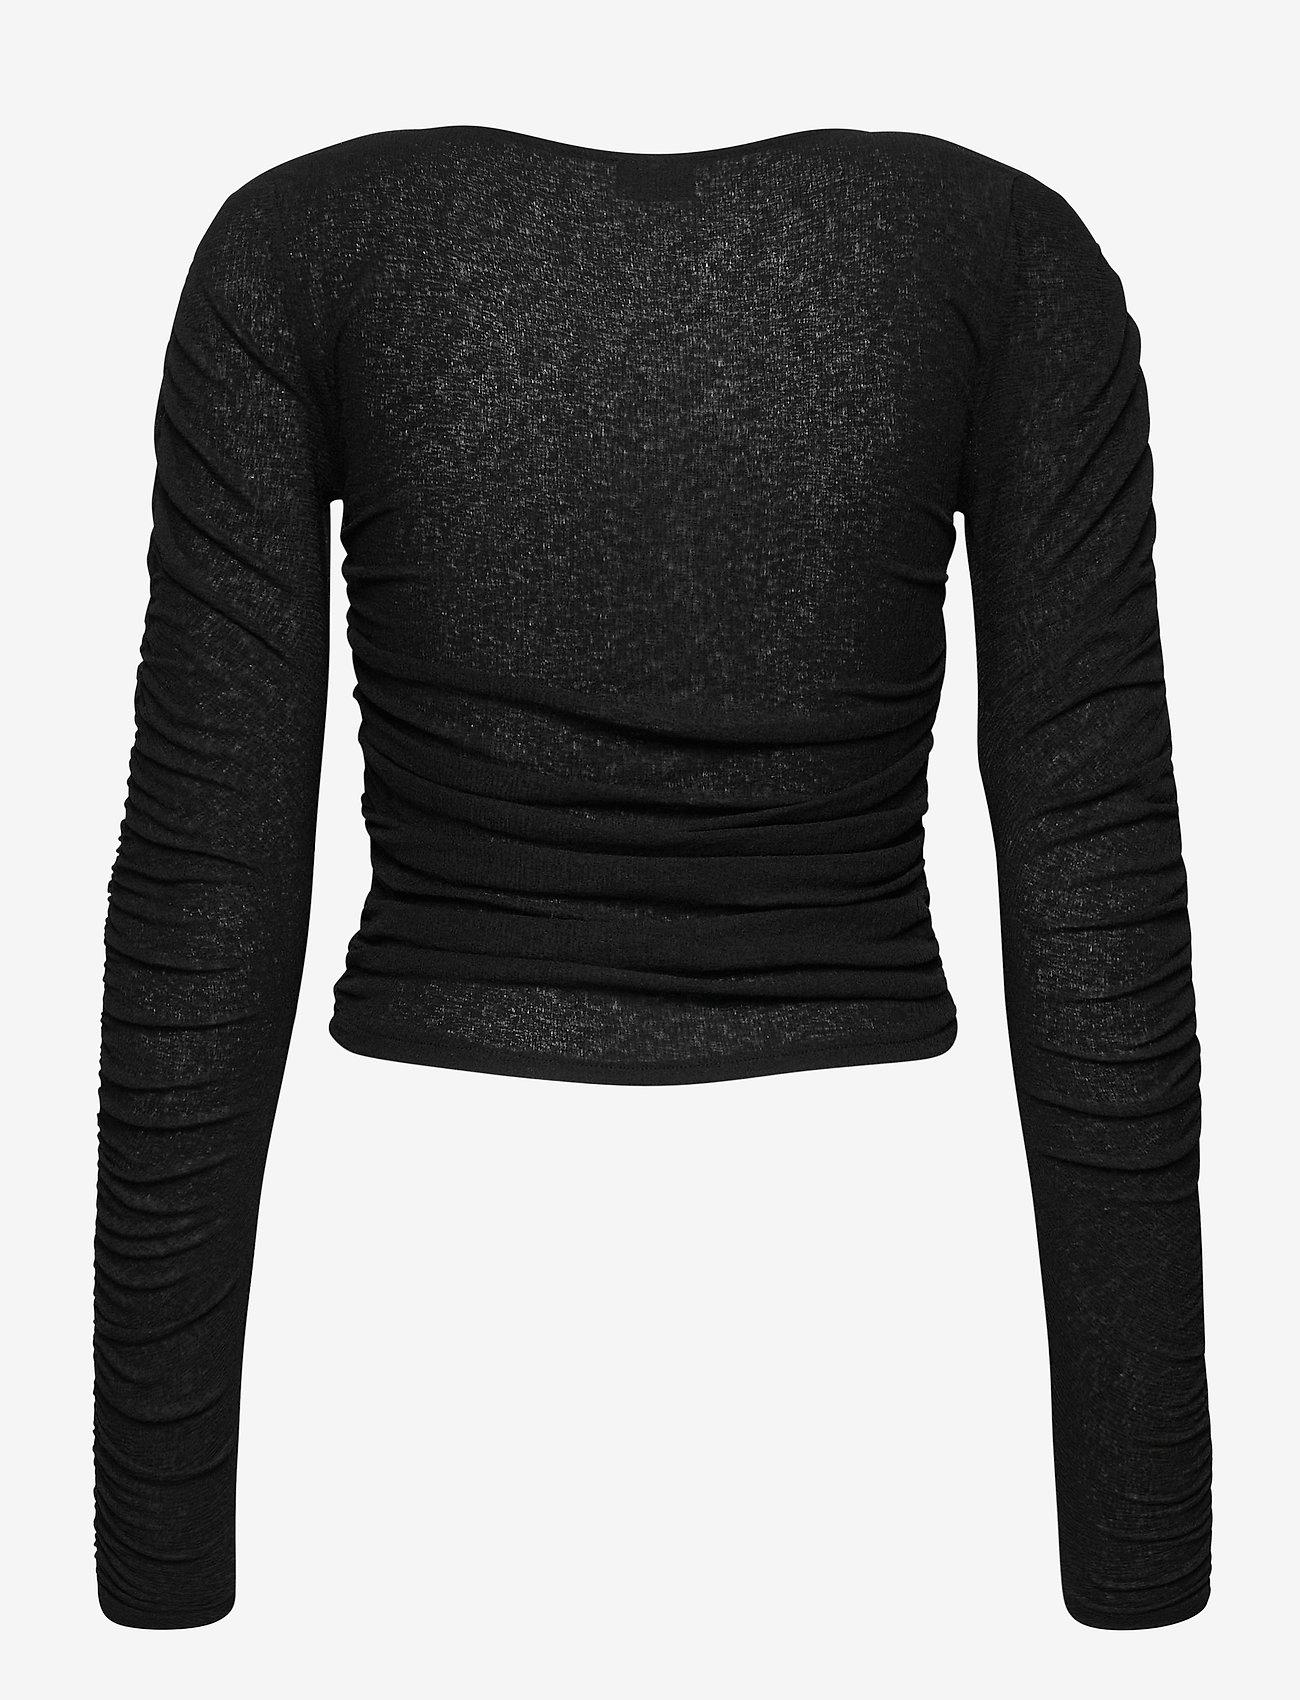 Gina Tricot - Rita top - langærmede toppe - black (9000) - 1